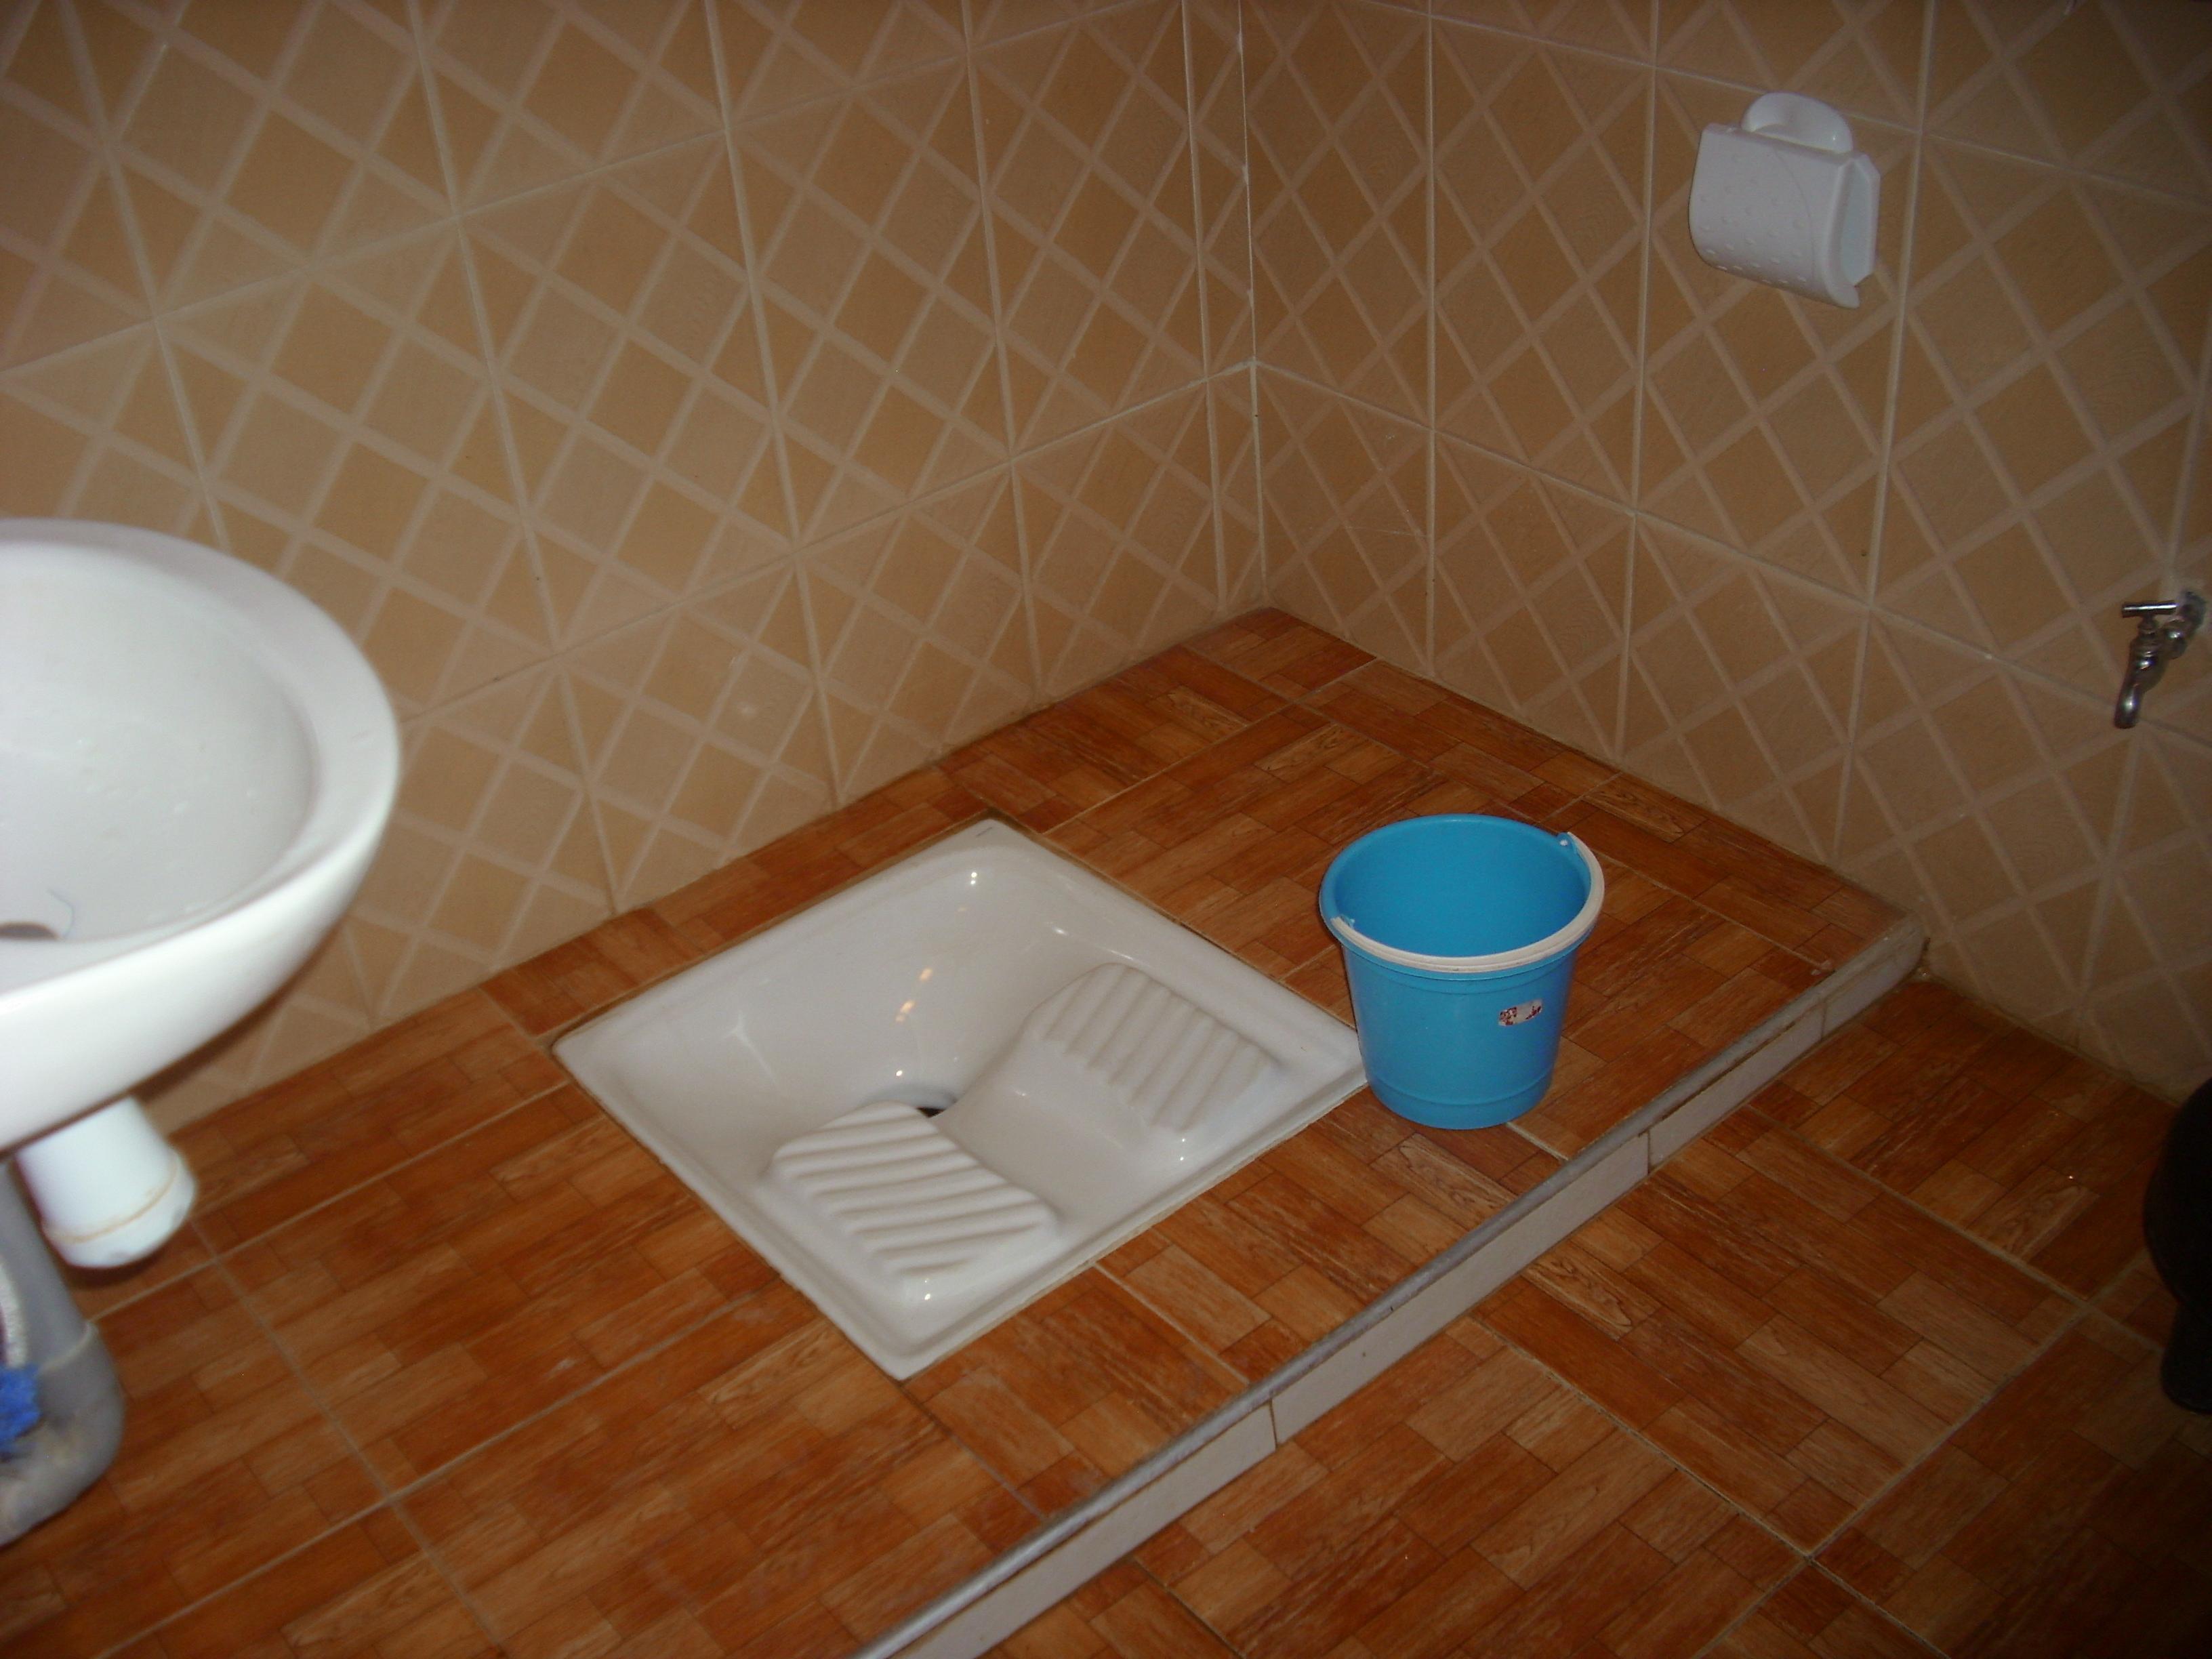 https://www.draco-sapienza.it/wp-content/uploads/2015/06/toilette.jpg